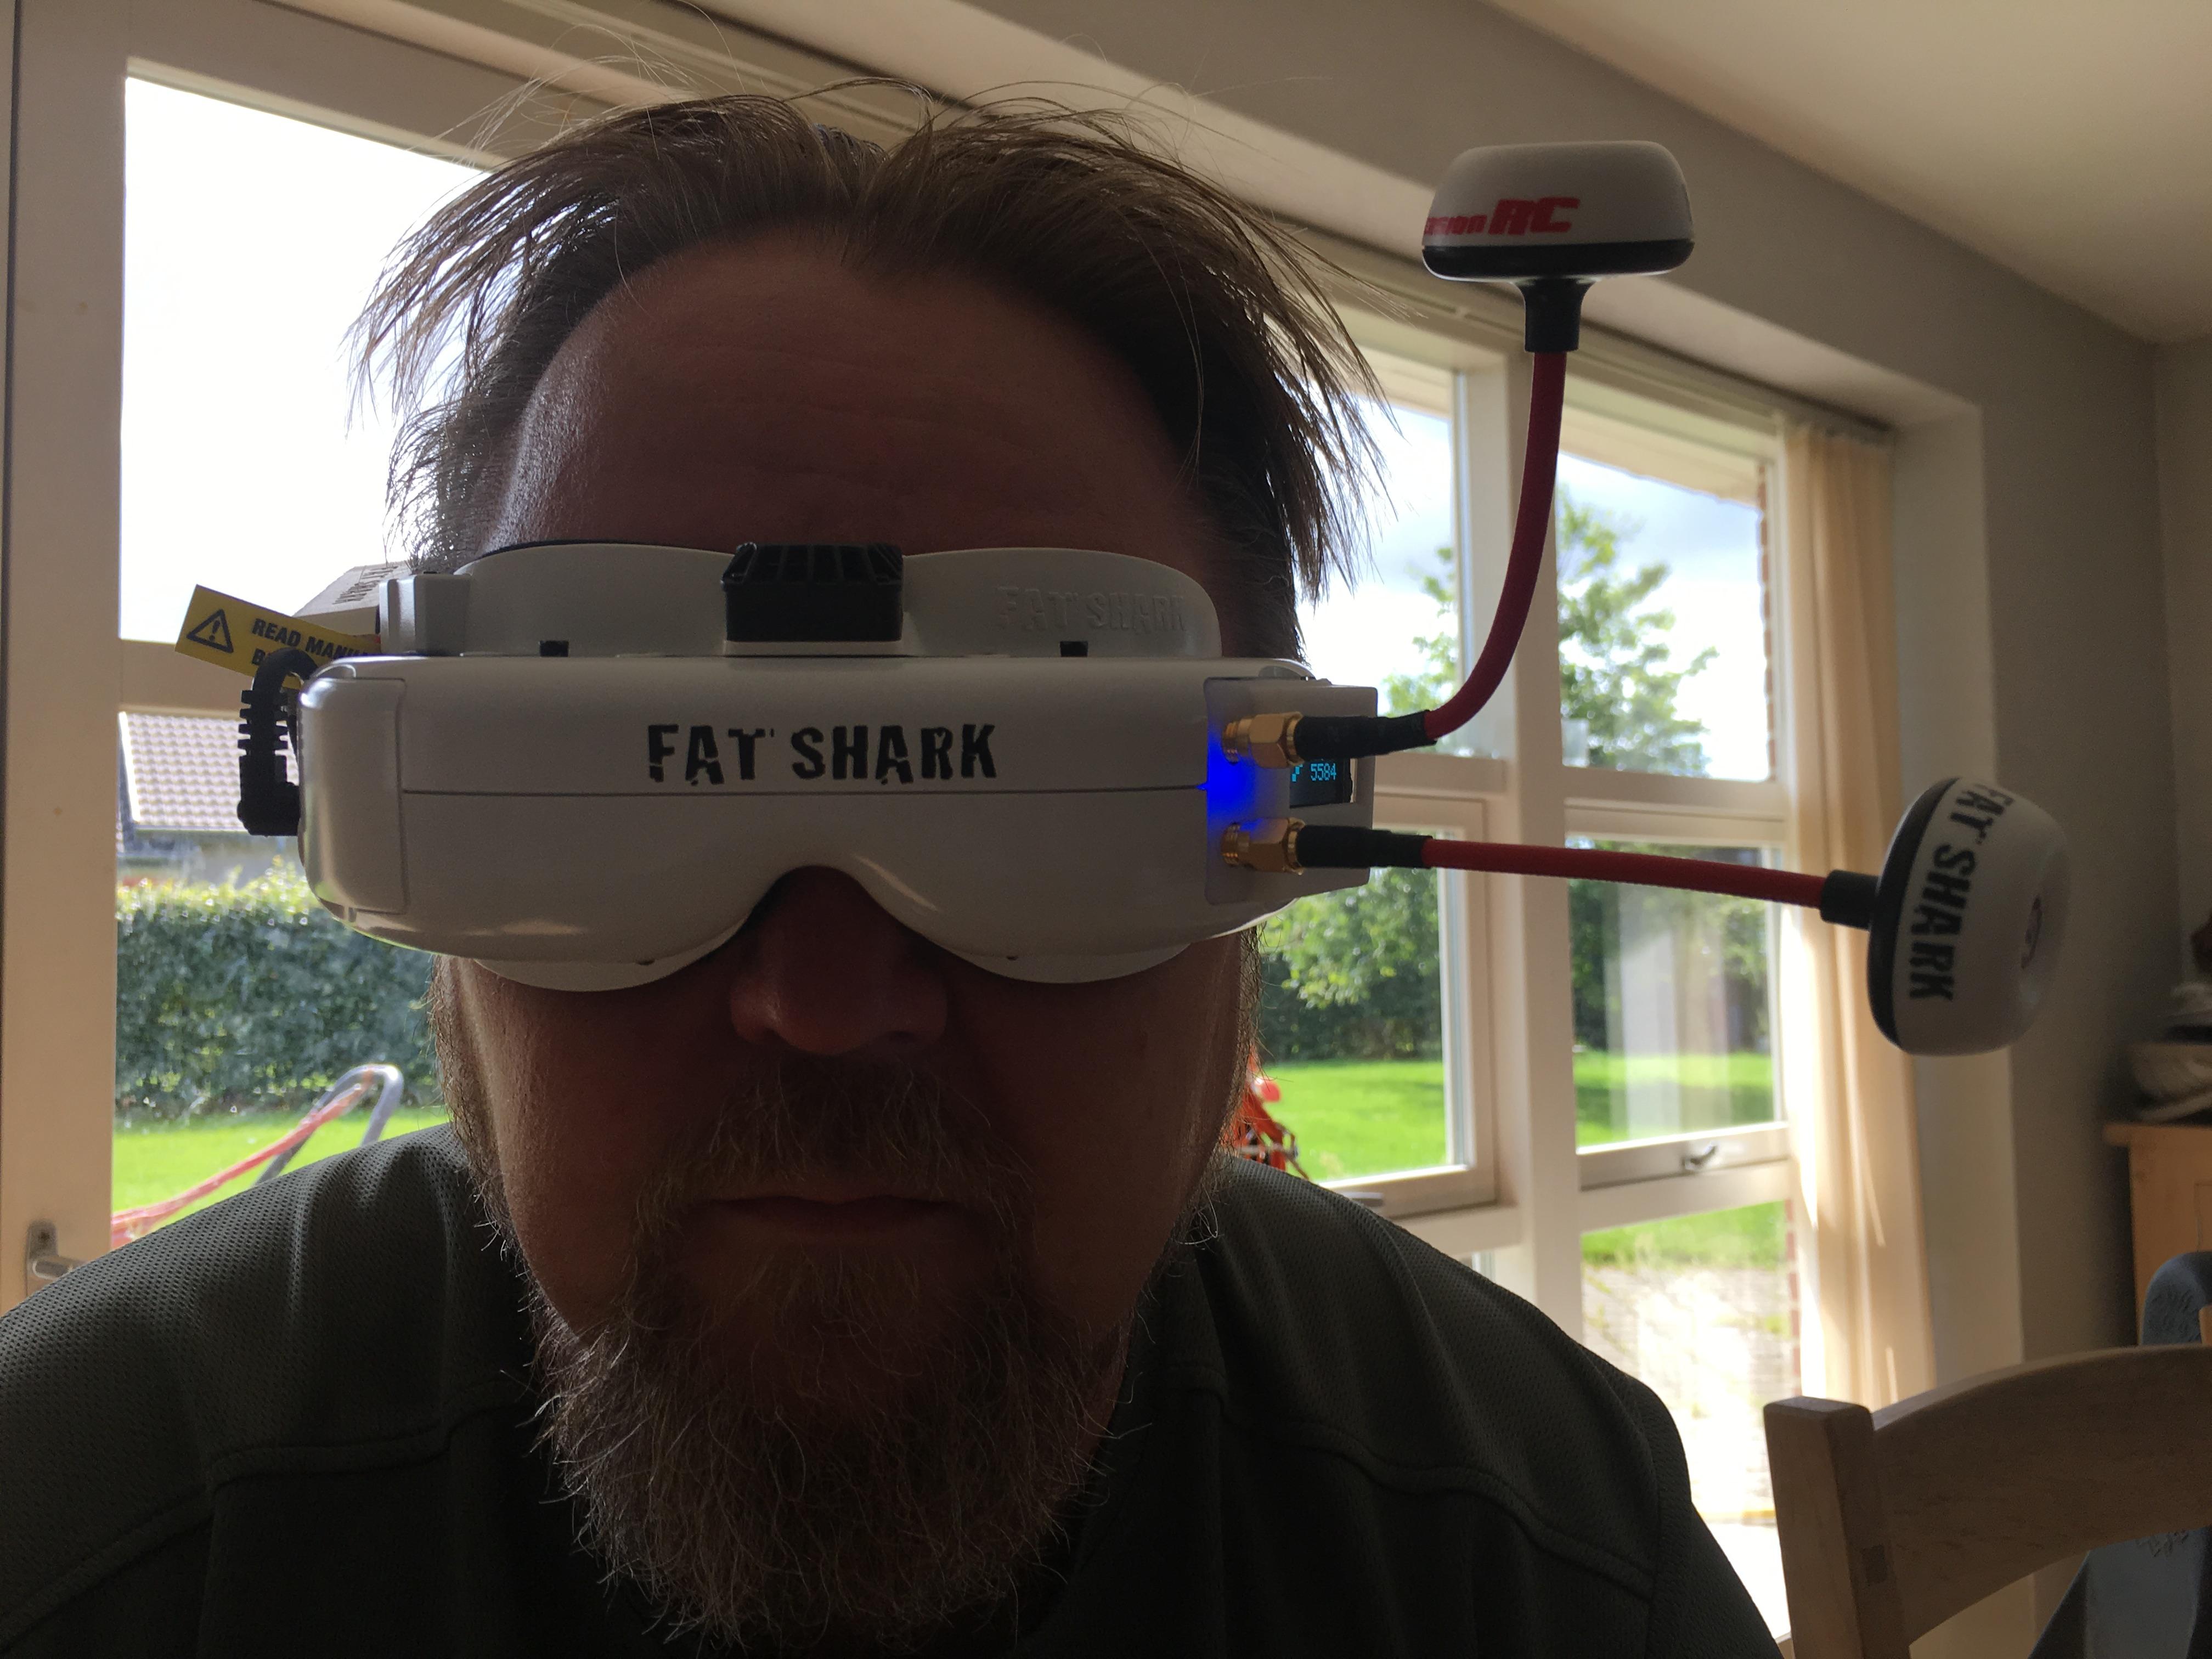 FPV briller